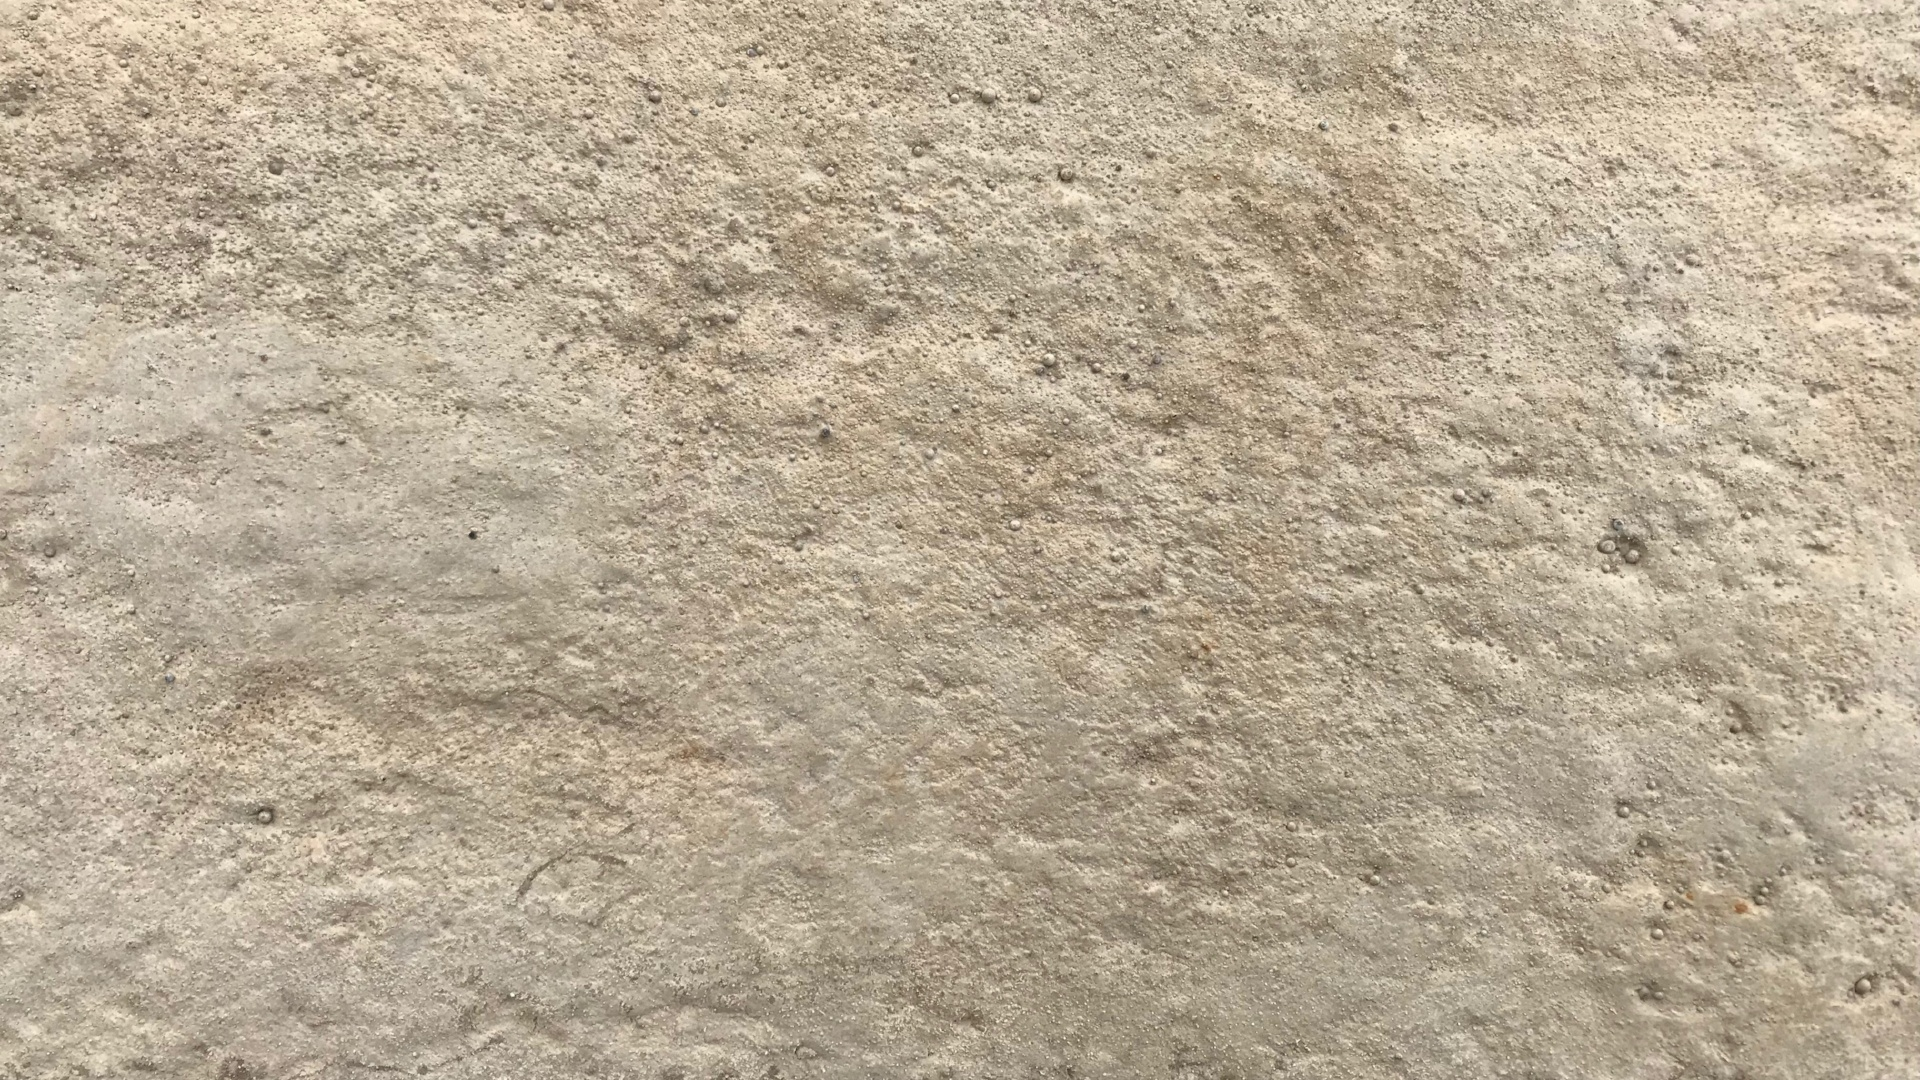 Sand-1080